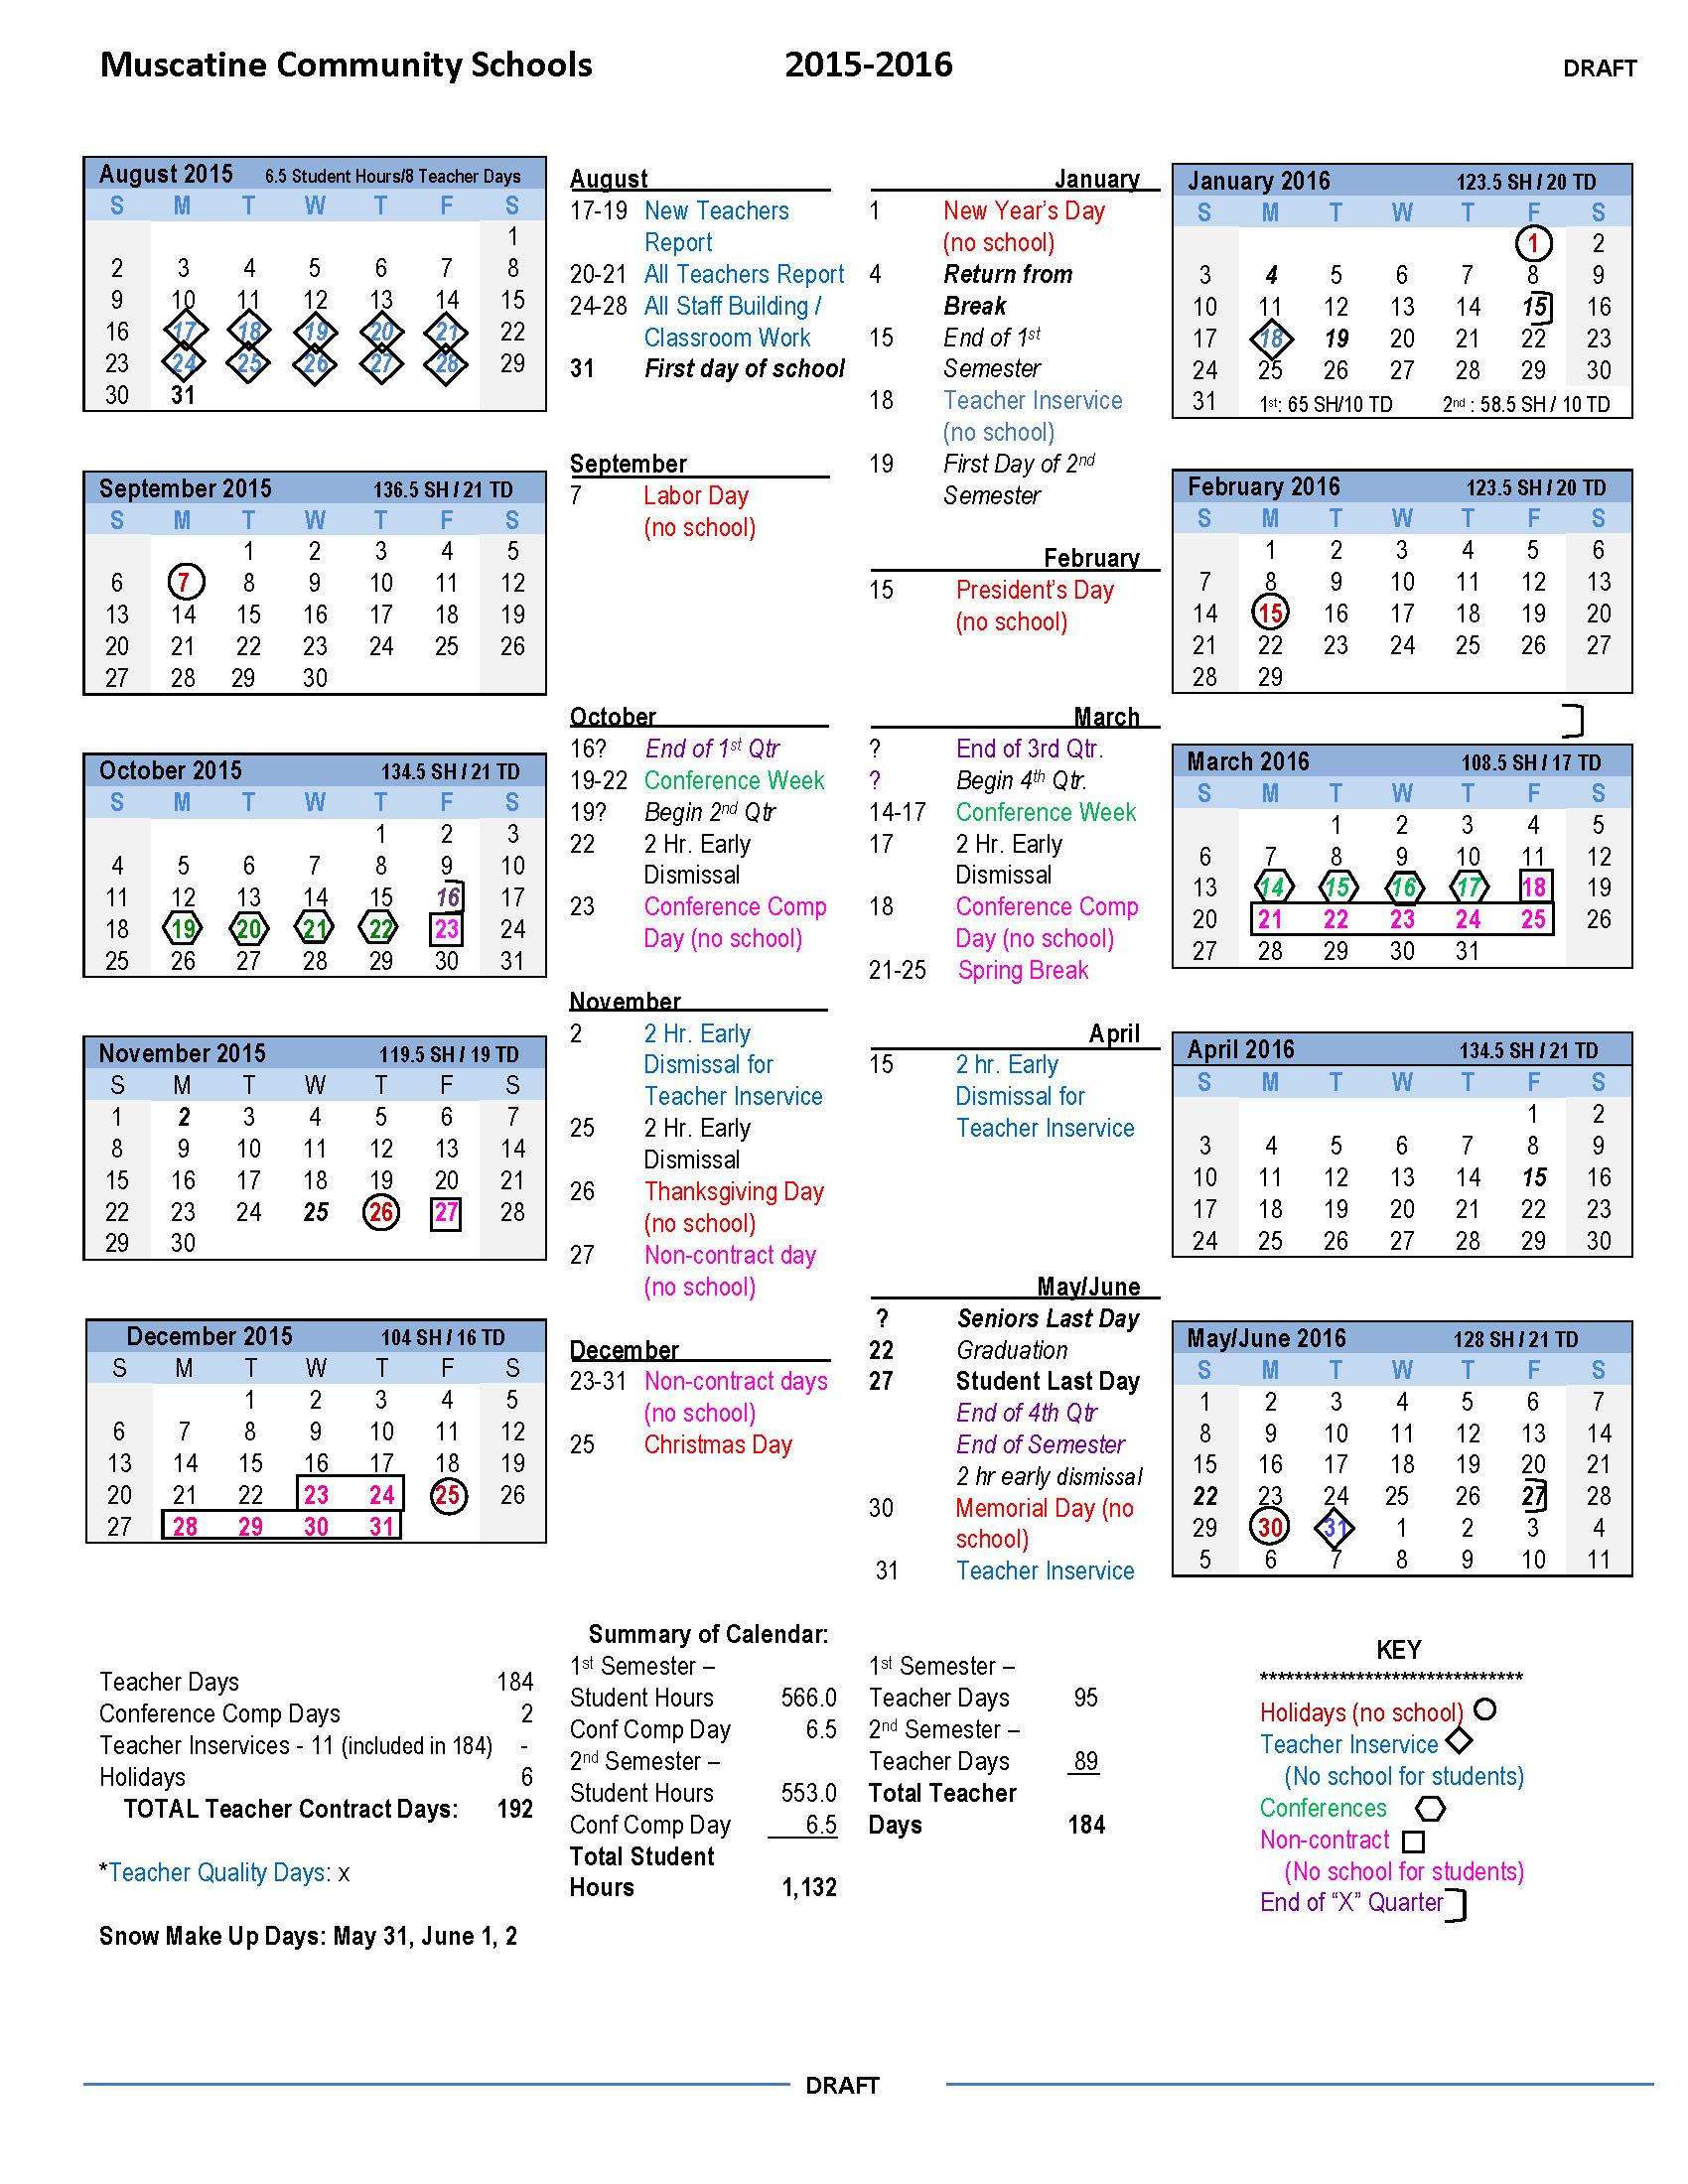 2015-16 Draft Calendar